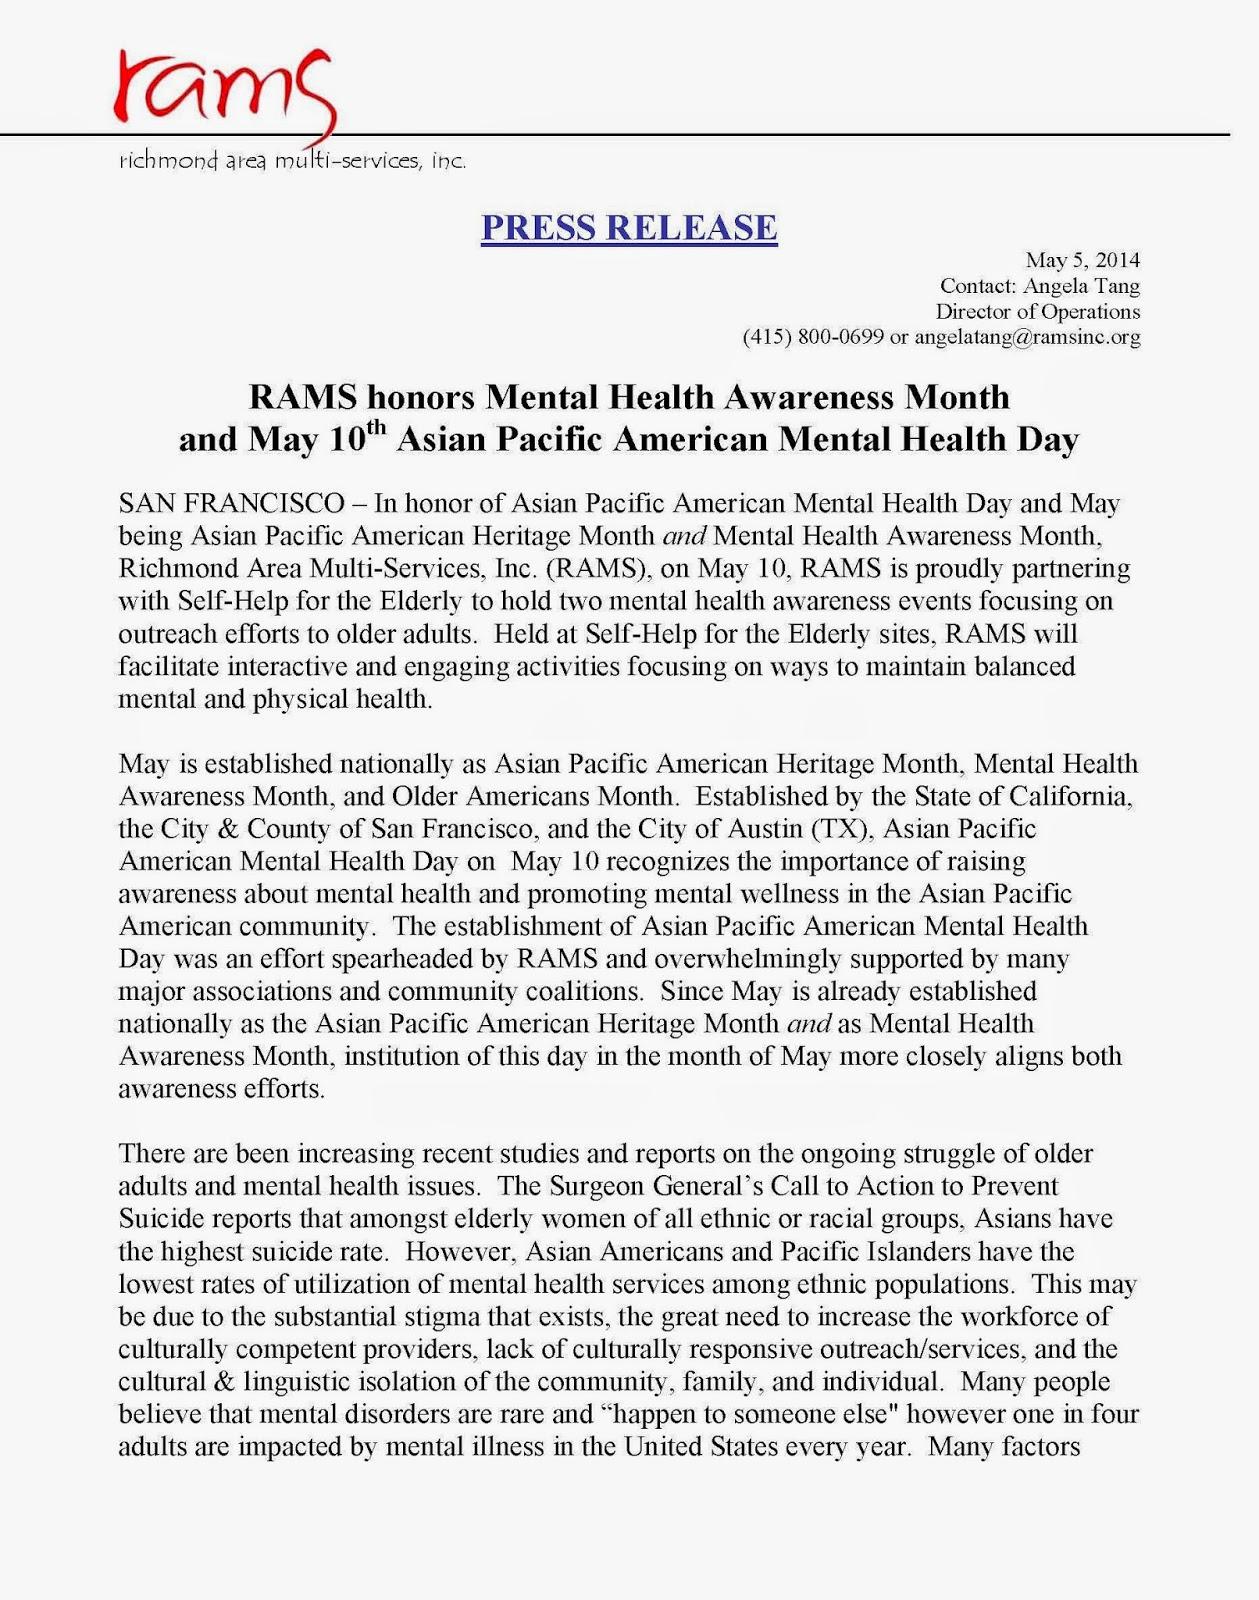 Rams A Comprehensive Mental Health Services Agency In San Francisco